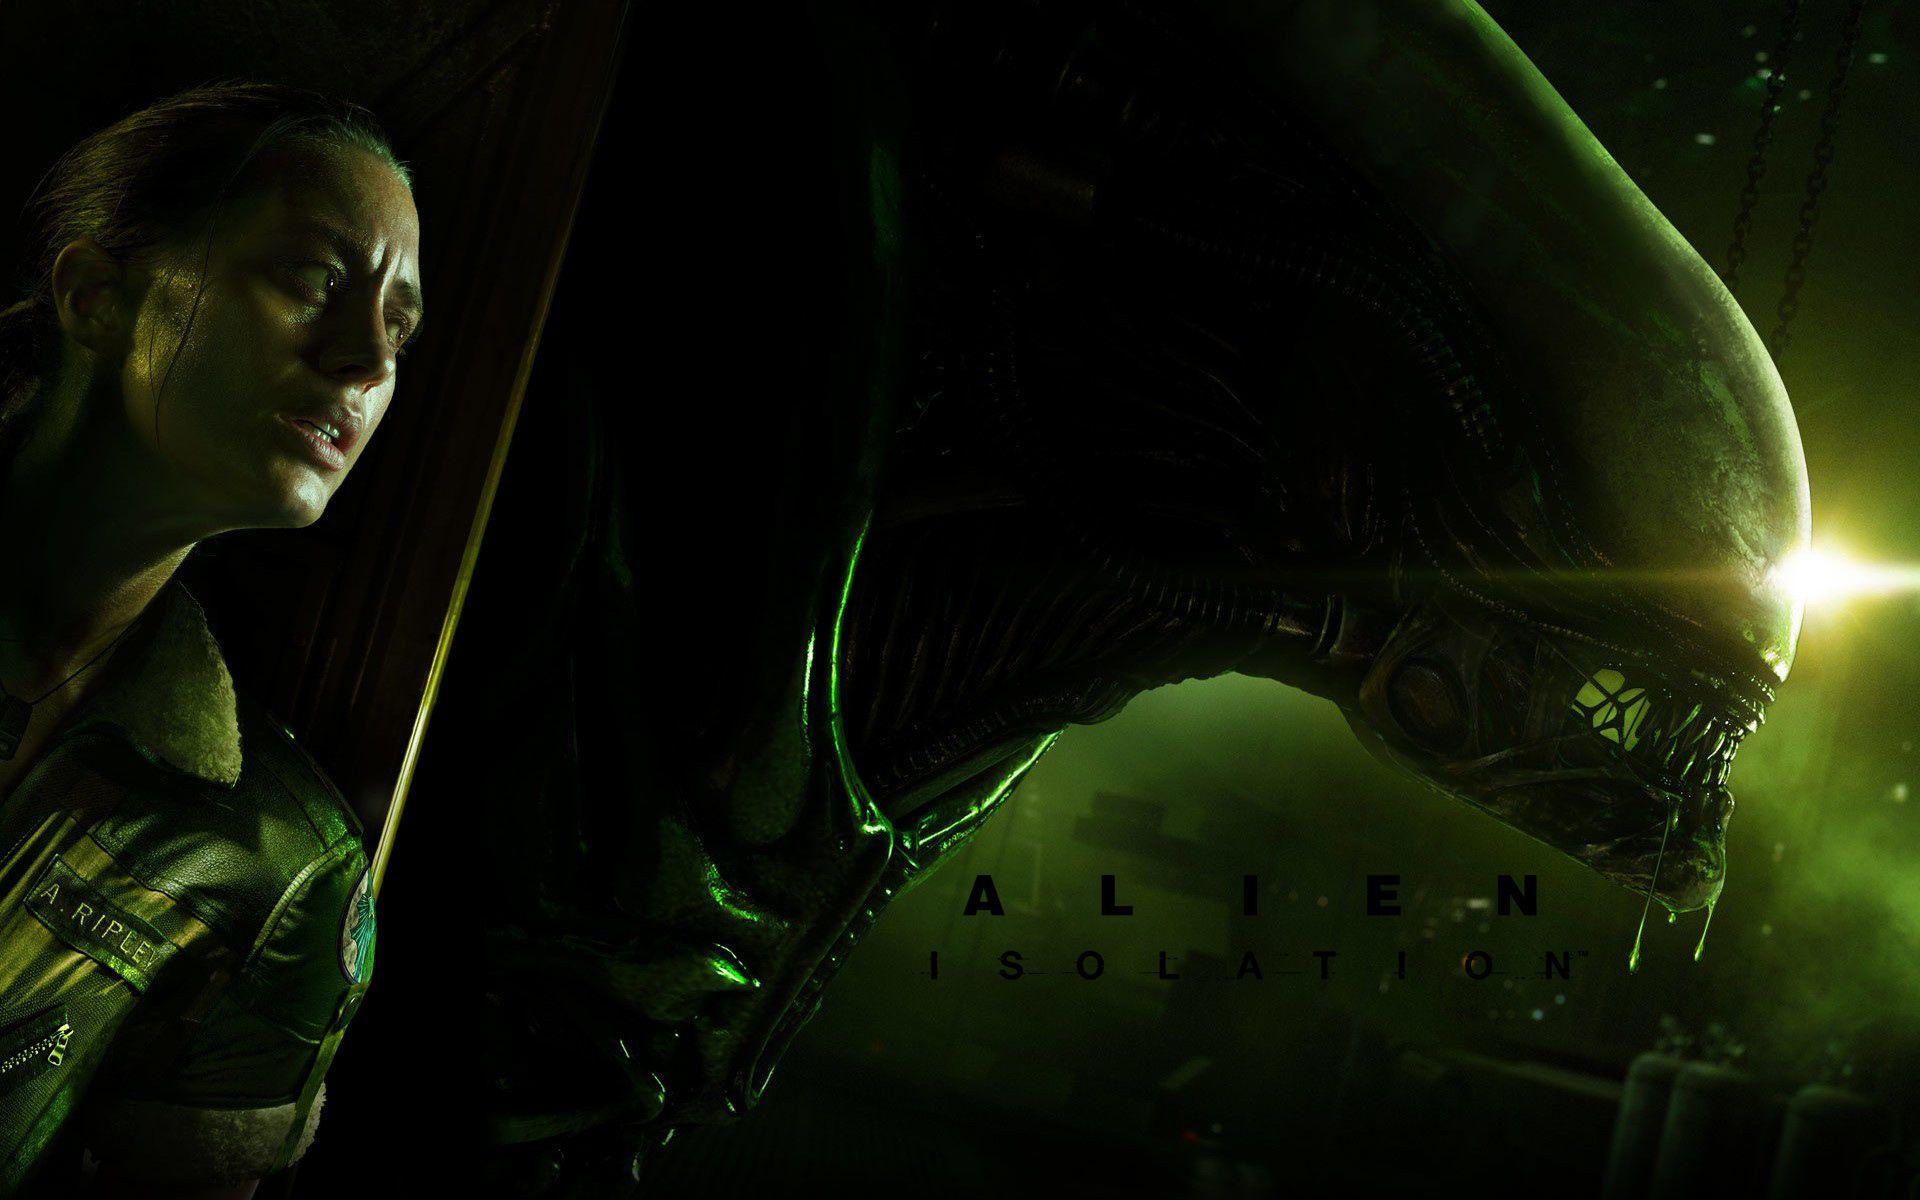 Alien Isolation Game Wide Alien Isolation Alien Isolation Game Alien Sightings